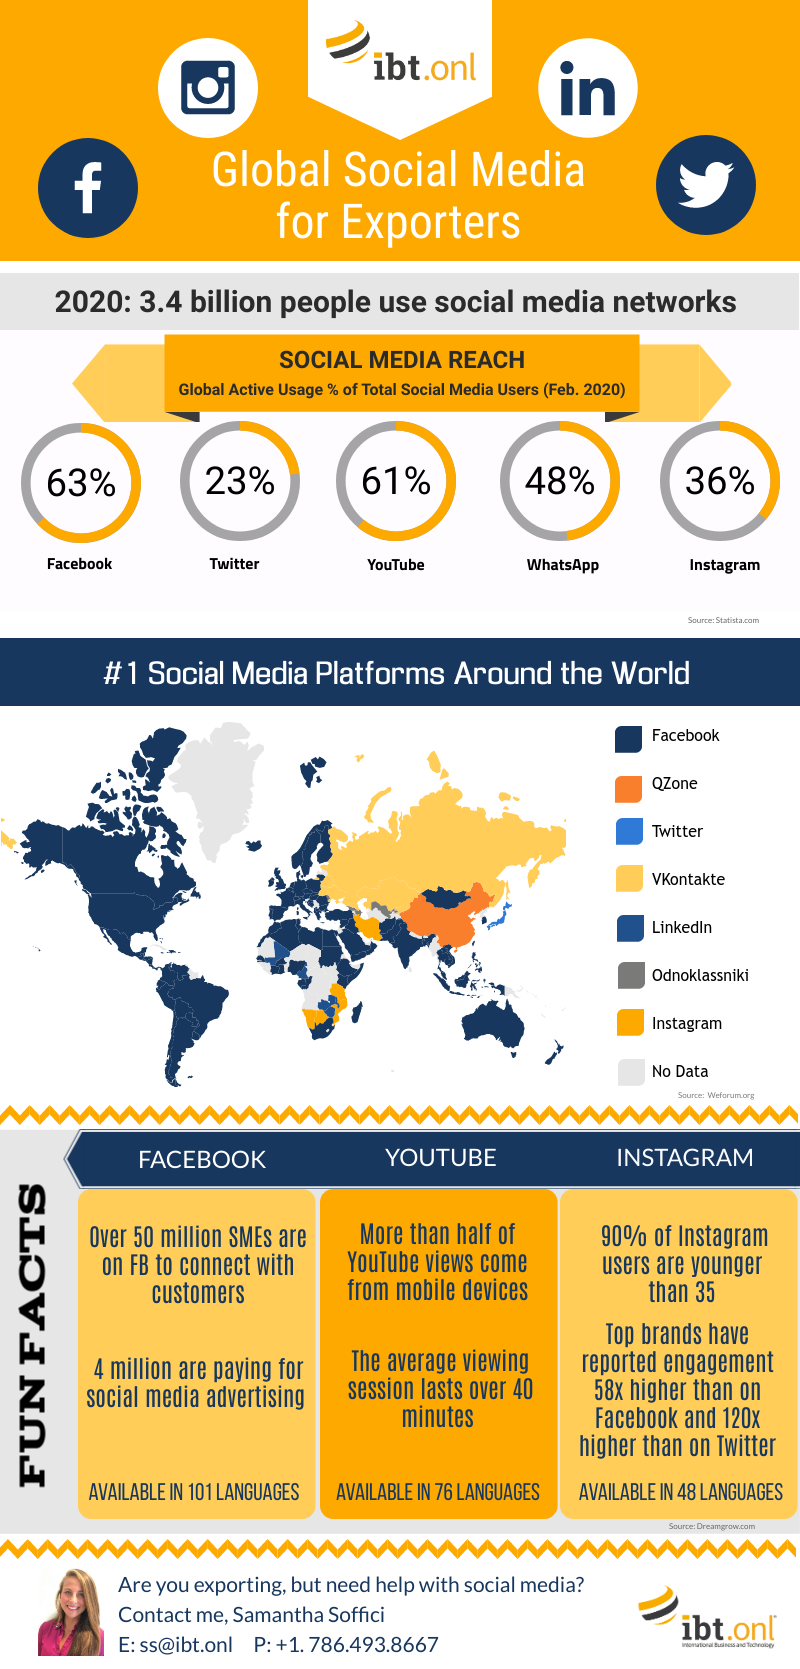 Global-Social-Media-for-Exporters